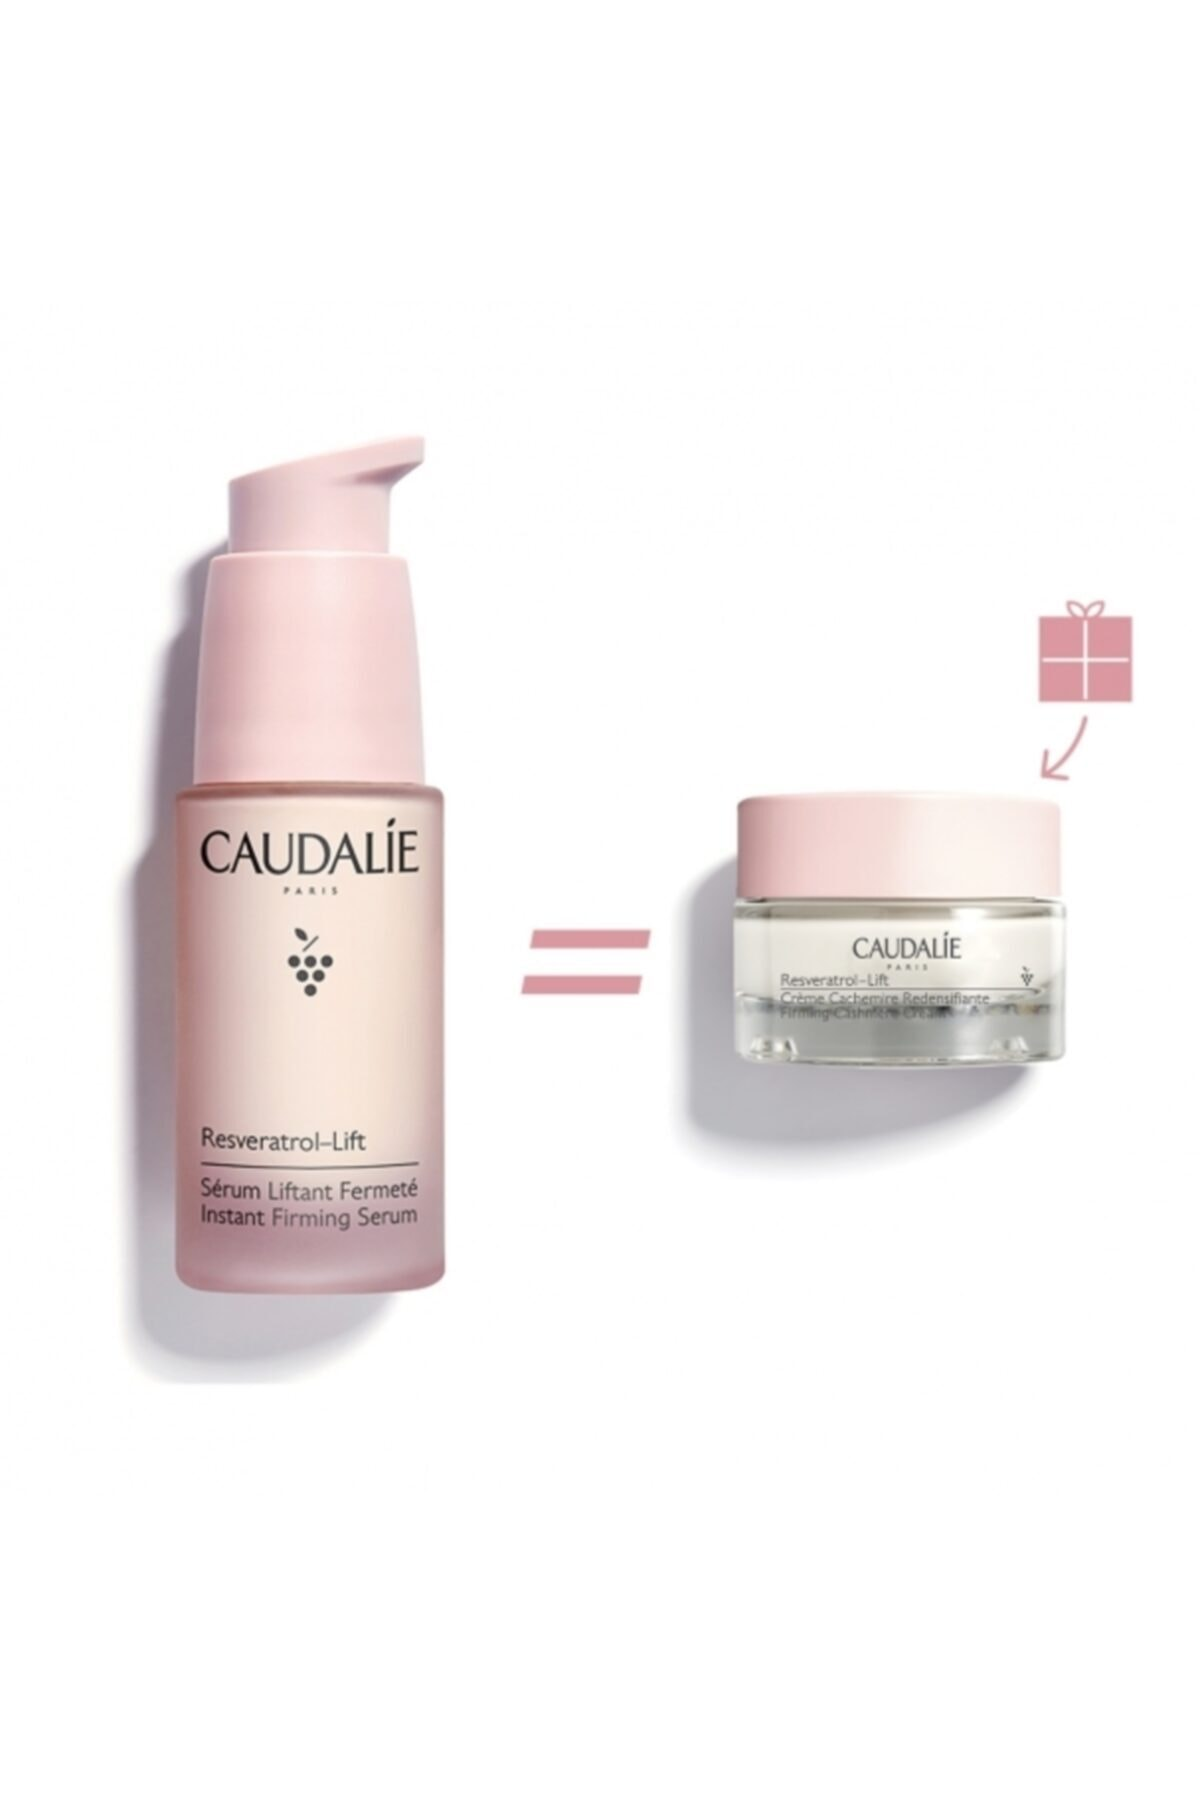 Caudalie Yeni Vegan 30ml Resveratrol Firming Serum 15 ml Firming Cashmere Cream 1